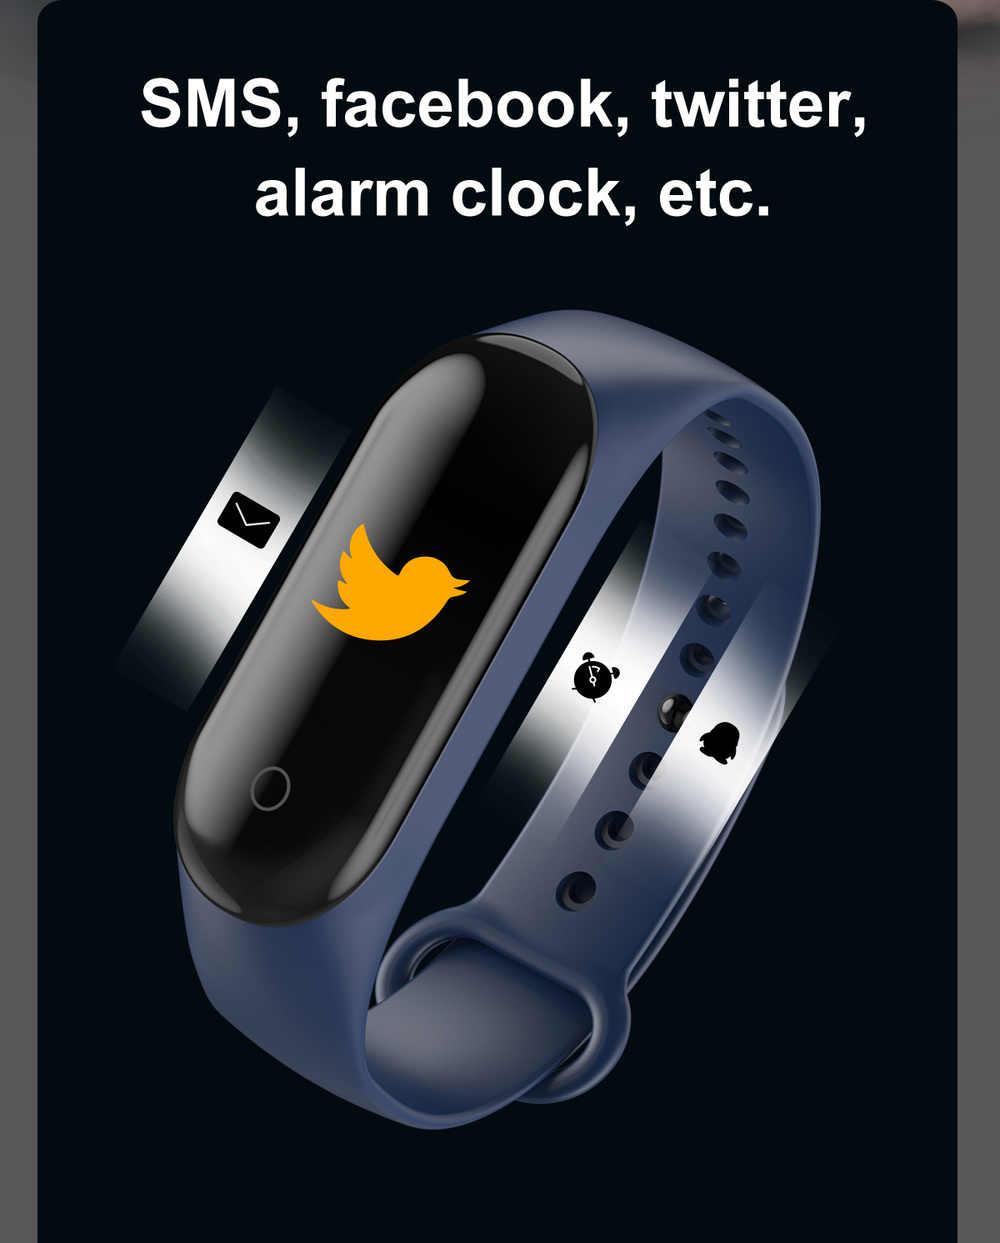 M4 חכם שעון IP67 Smartwatch לחץ דם קצב לב צג נשים גברים שינה גשש כושר ספורט שעון מיקרו USB טעינה